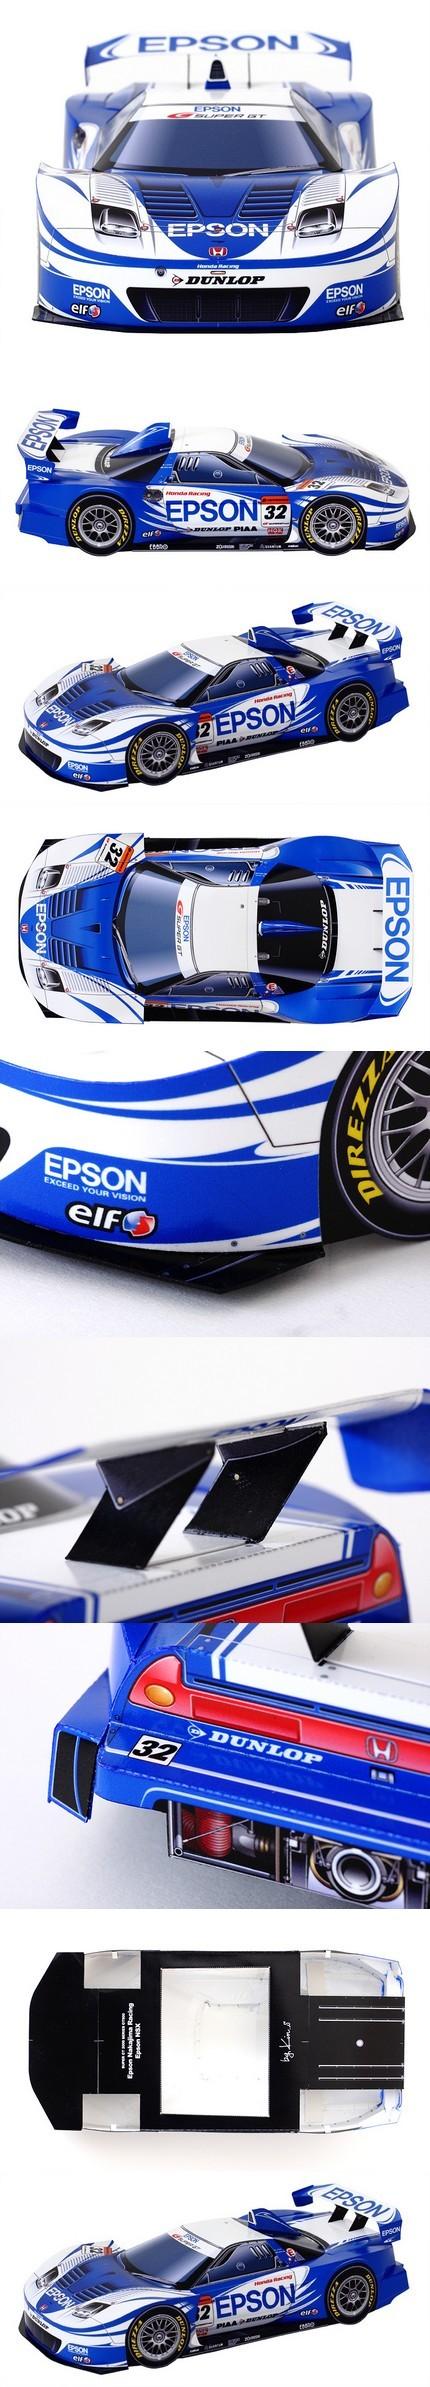 Epson Sports Car